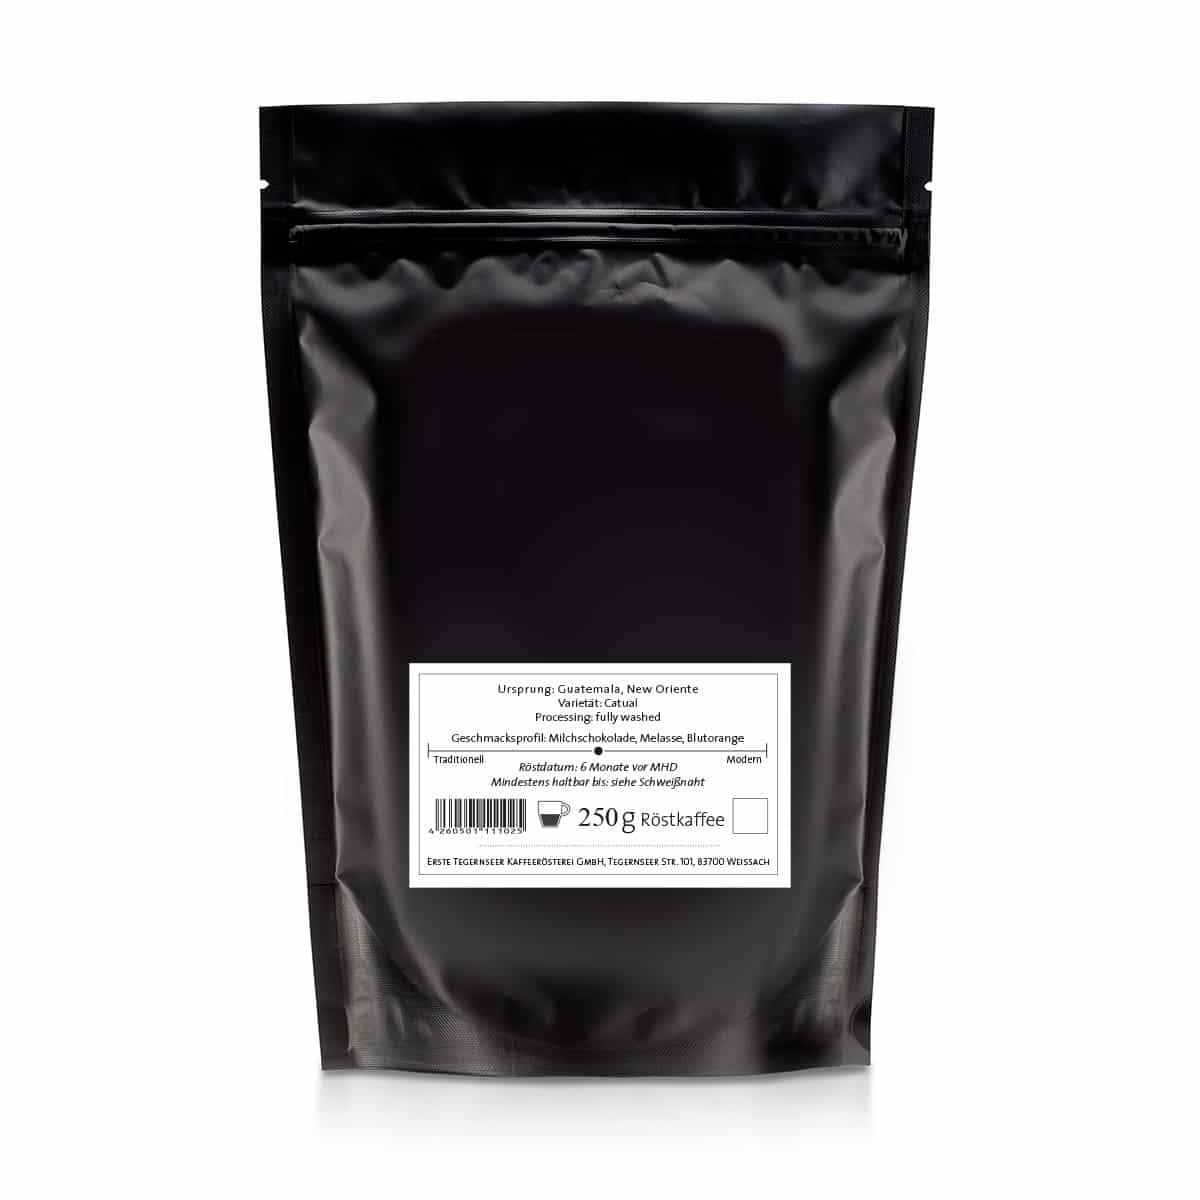 Espresso-Guatemala-Finca-El-Gigante-Catuai-fully-washed-HINTEN